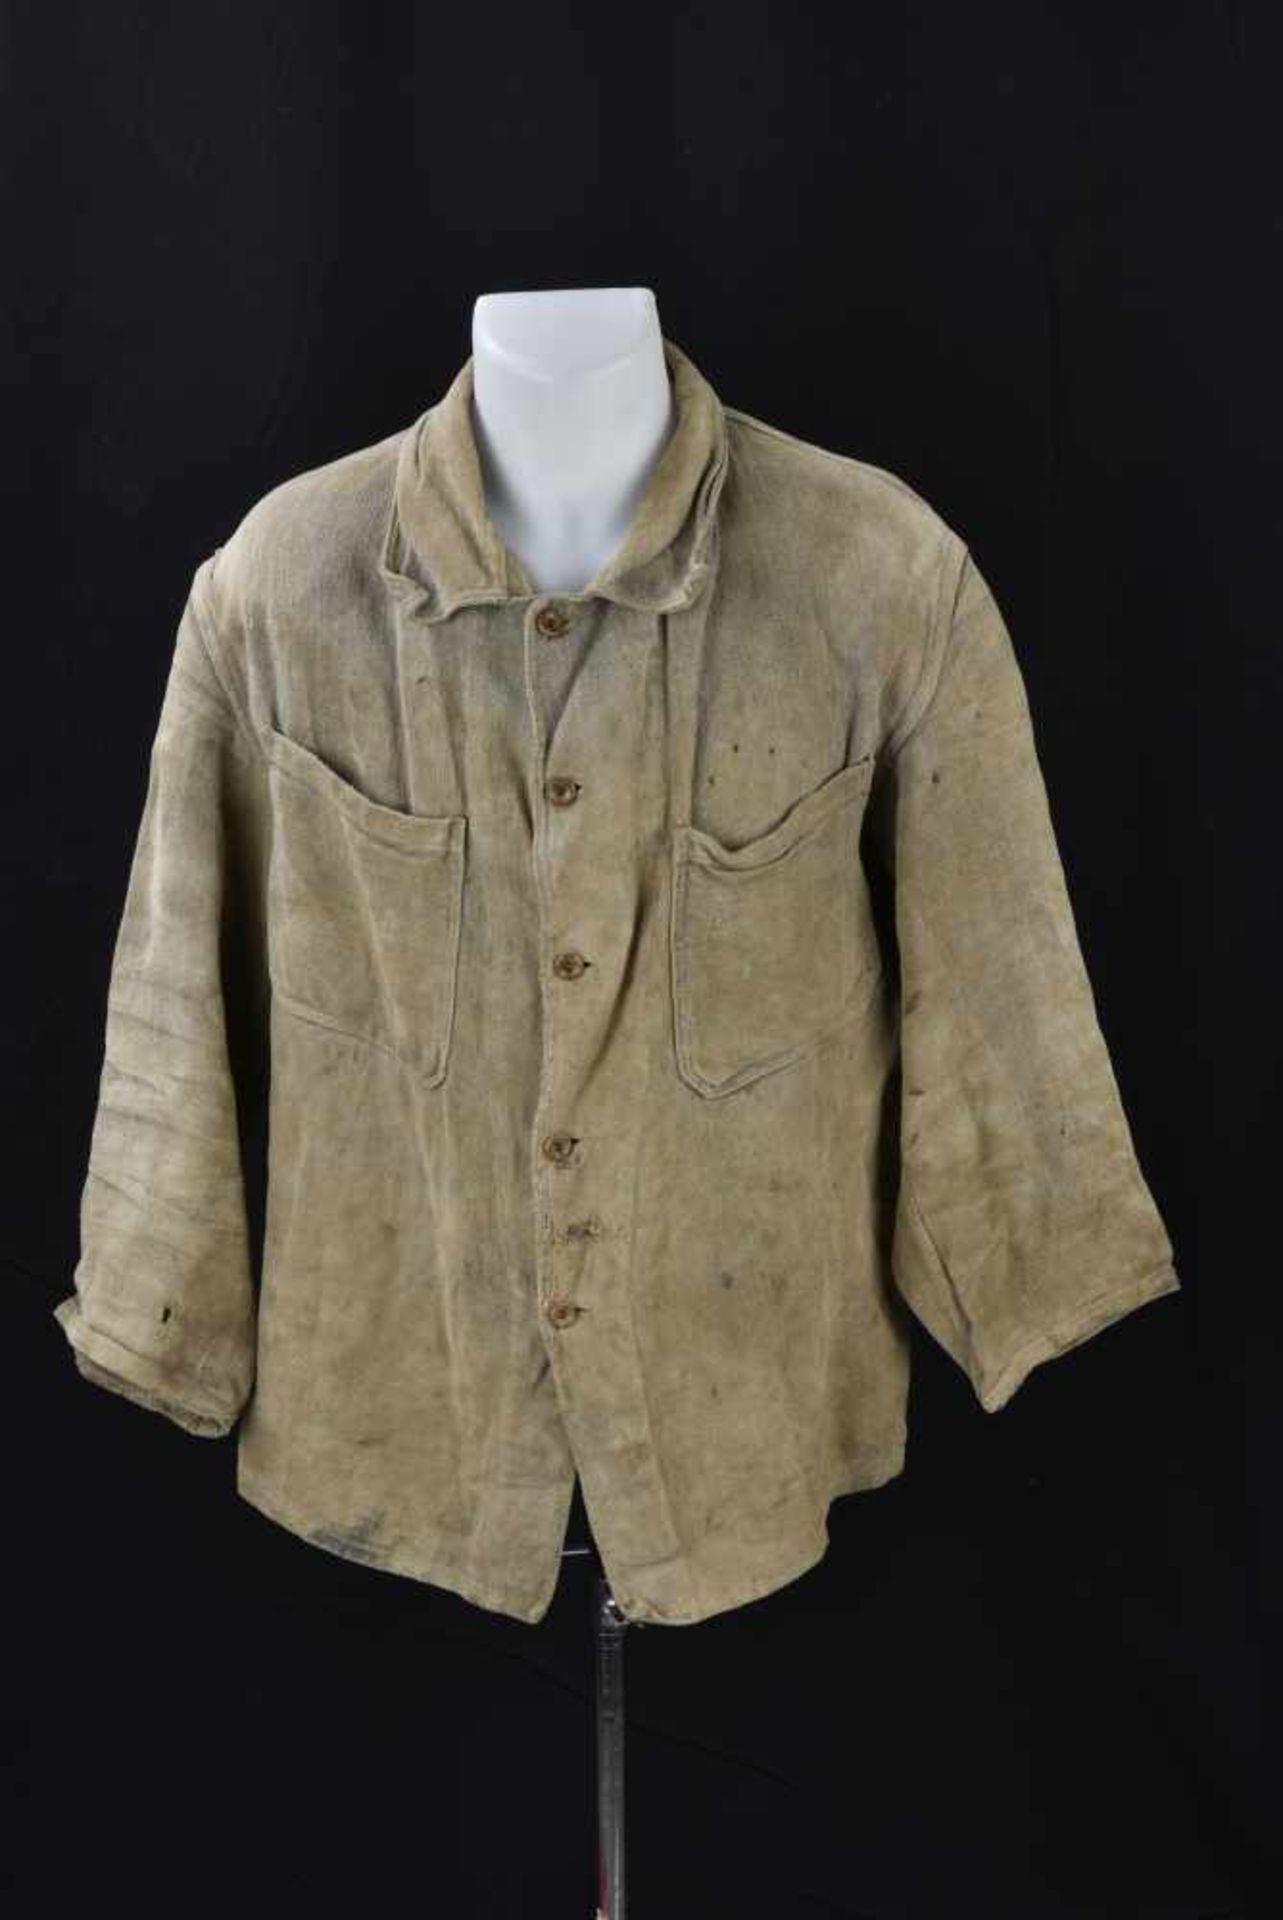 Veste de corvée en grosse toile. Datée 1938. Work jacket, in canvas. Dated 1938. Cette pièce